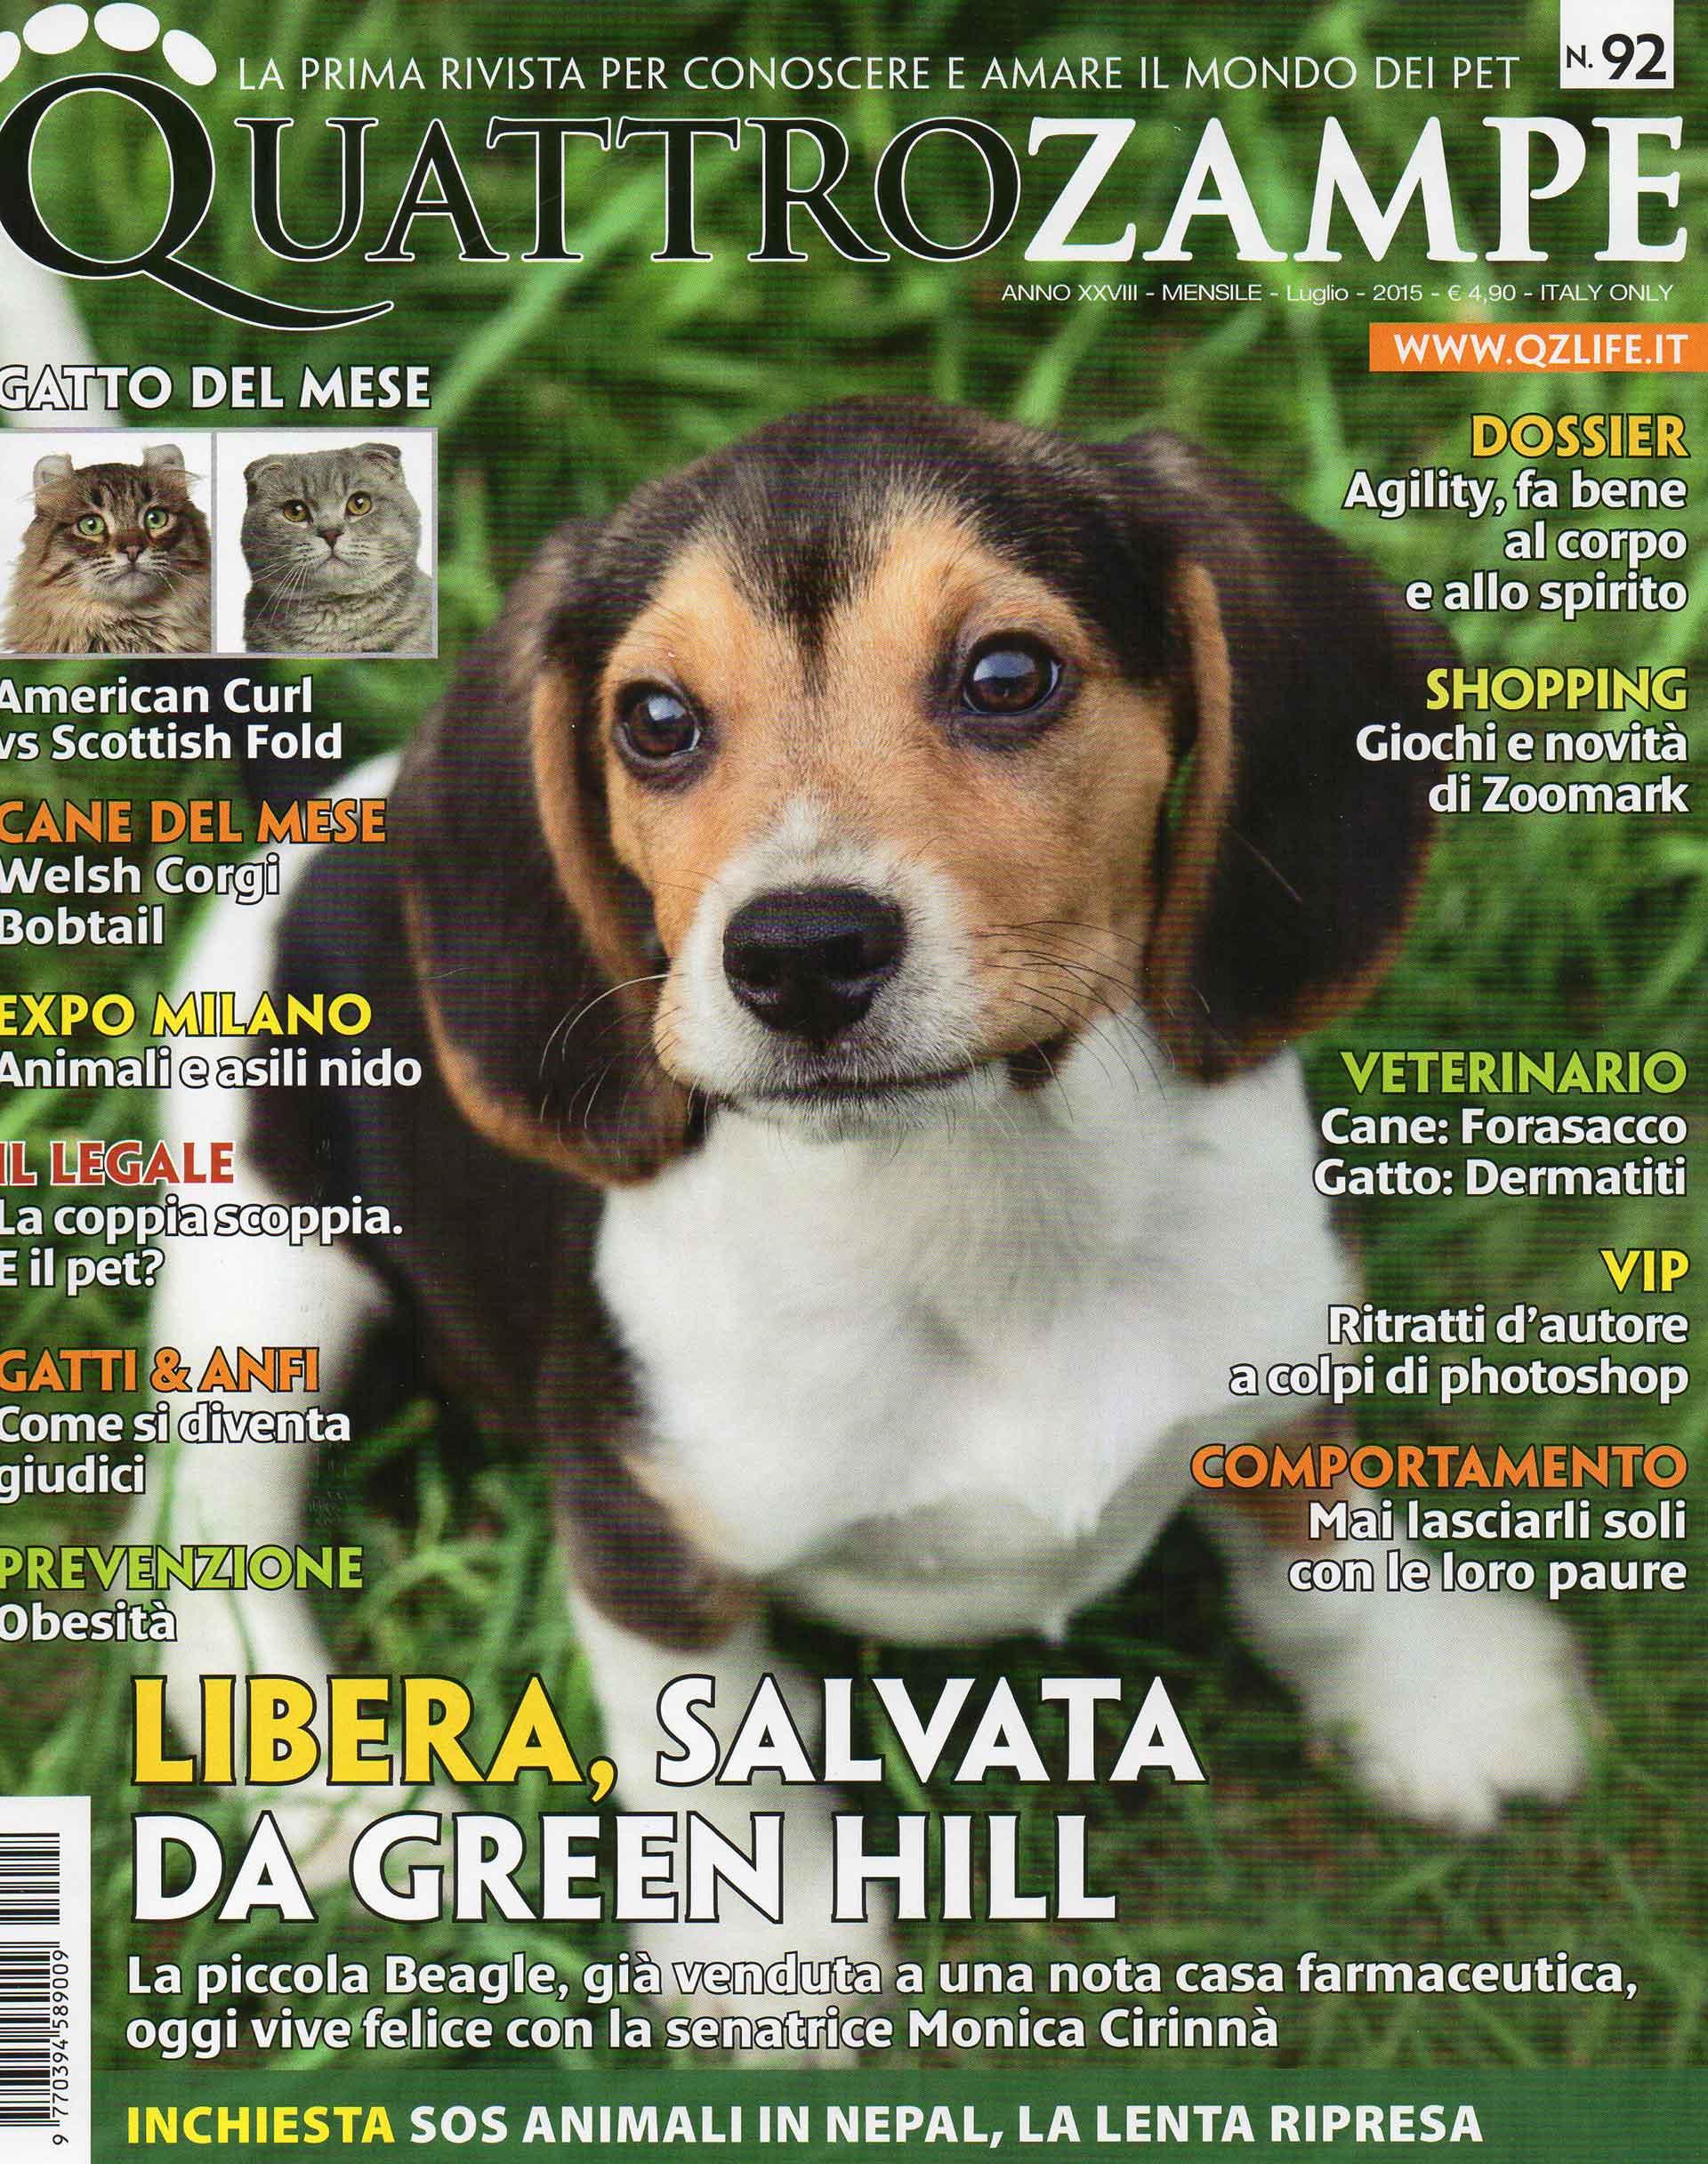 quattro-zampe-bauclub-asilo-educazione-cani-milano-01